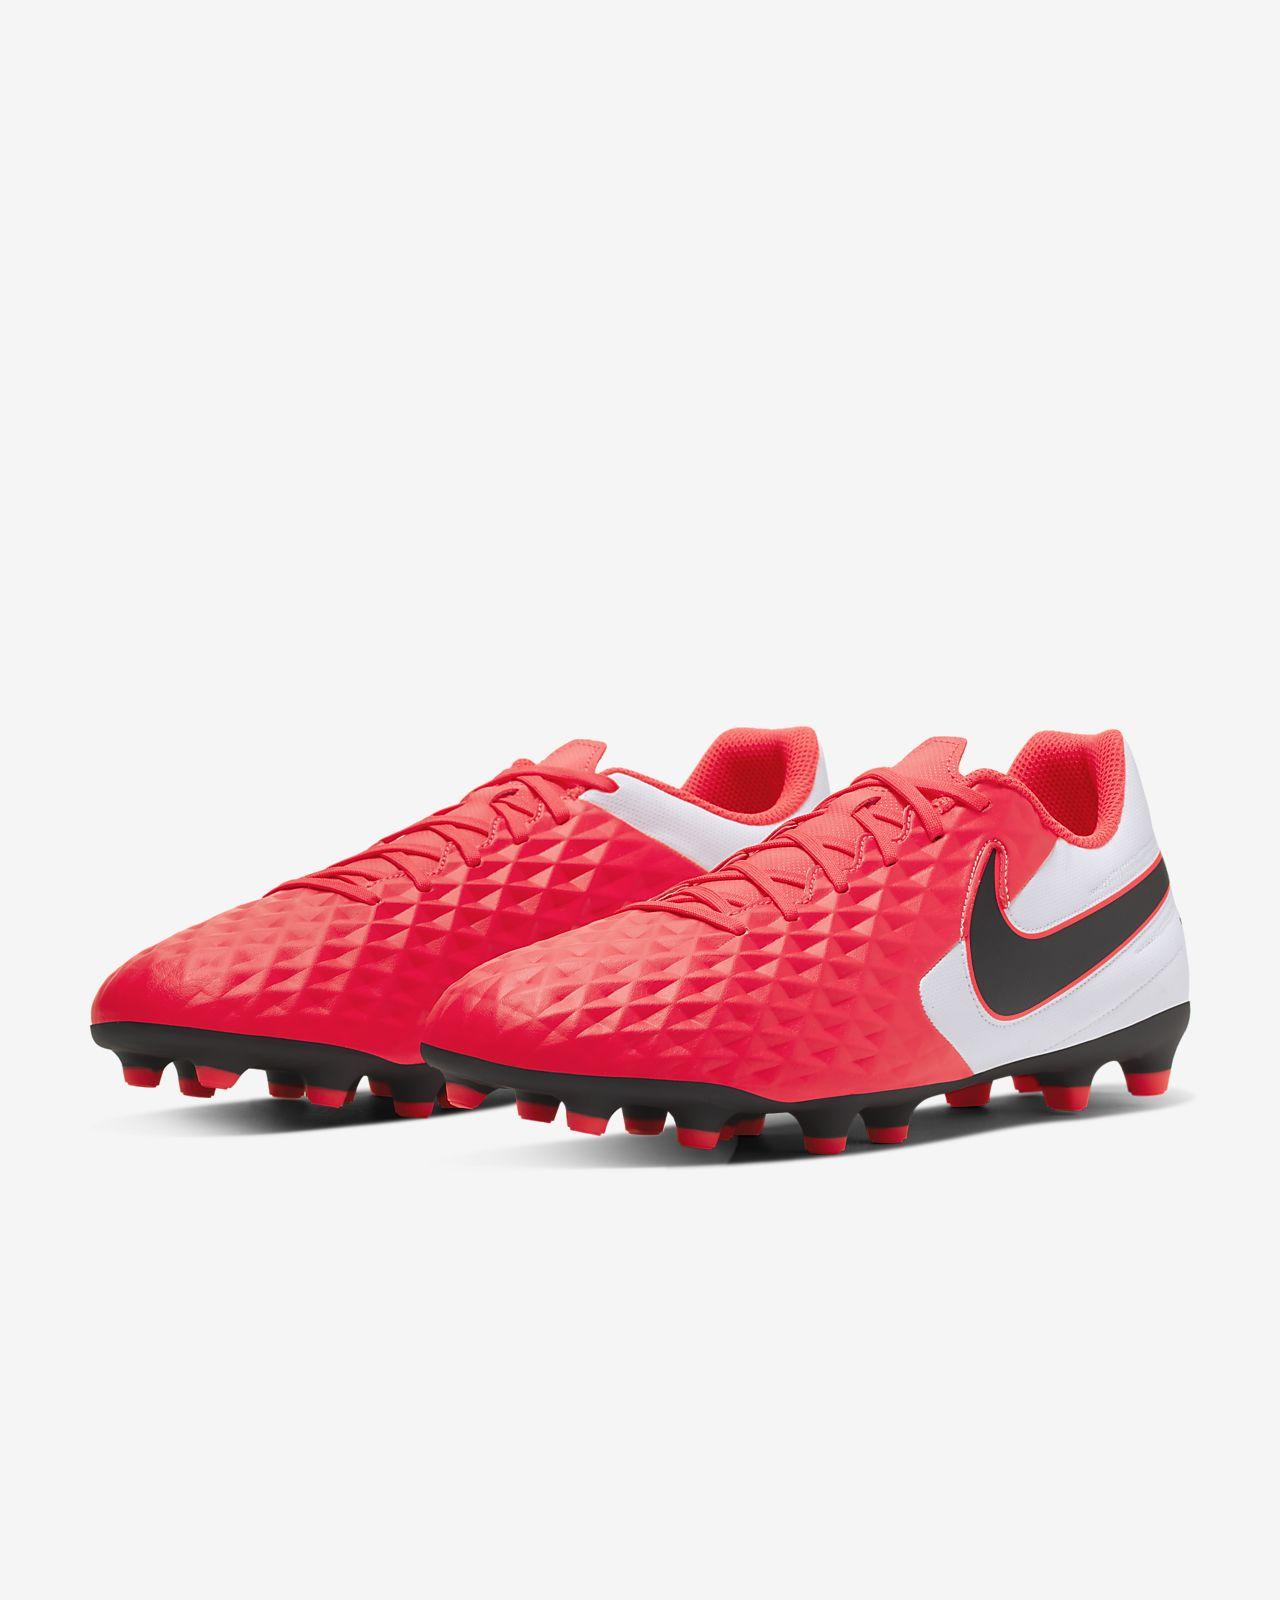 Últimas tendencias gama exclusiva bonito diseño Nike Tiempo Legend 8 Club MG Multi-Ground Football Boot. Nike CA